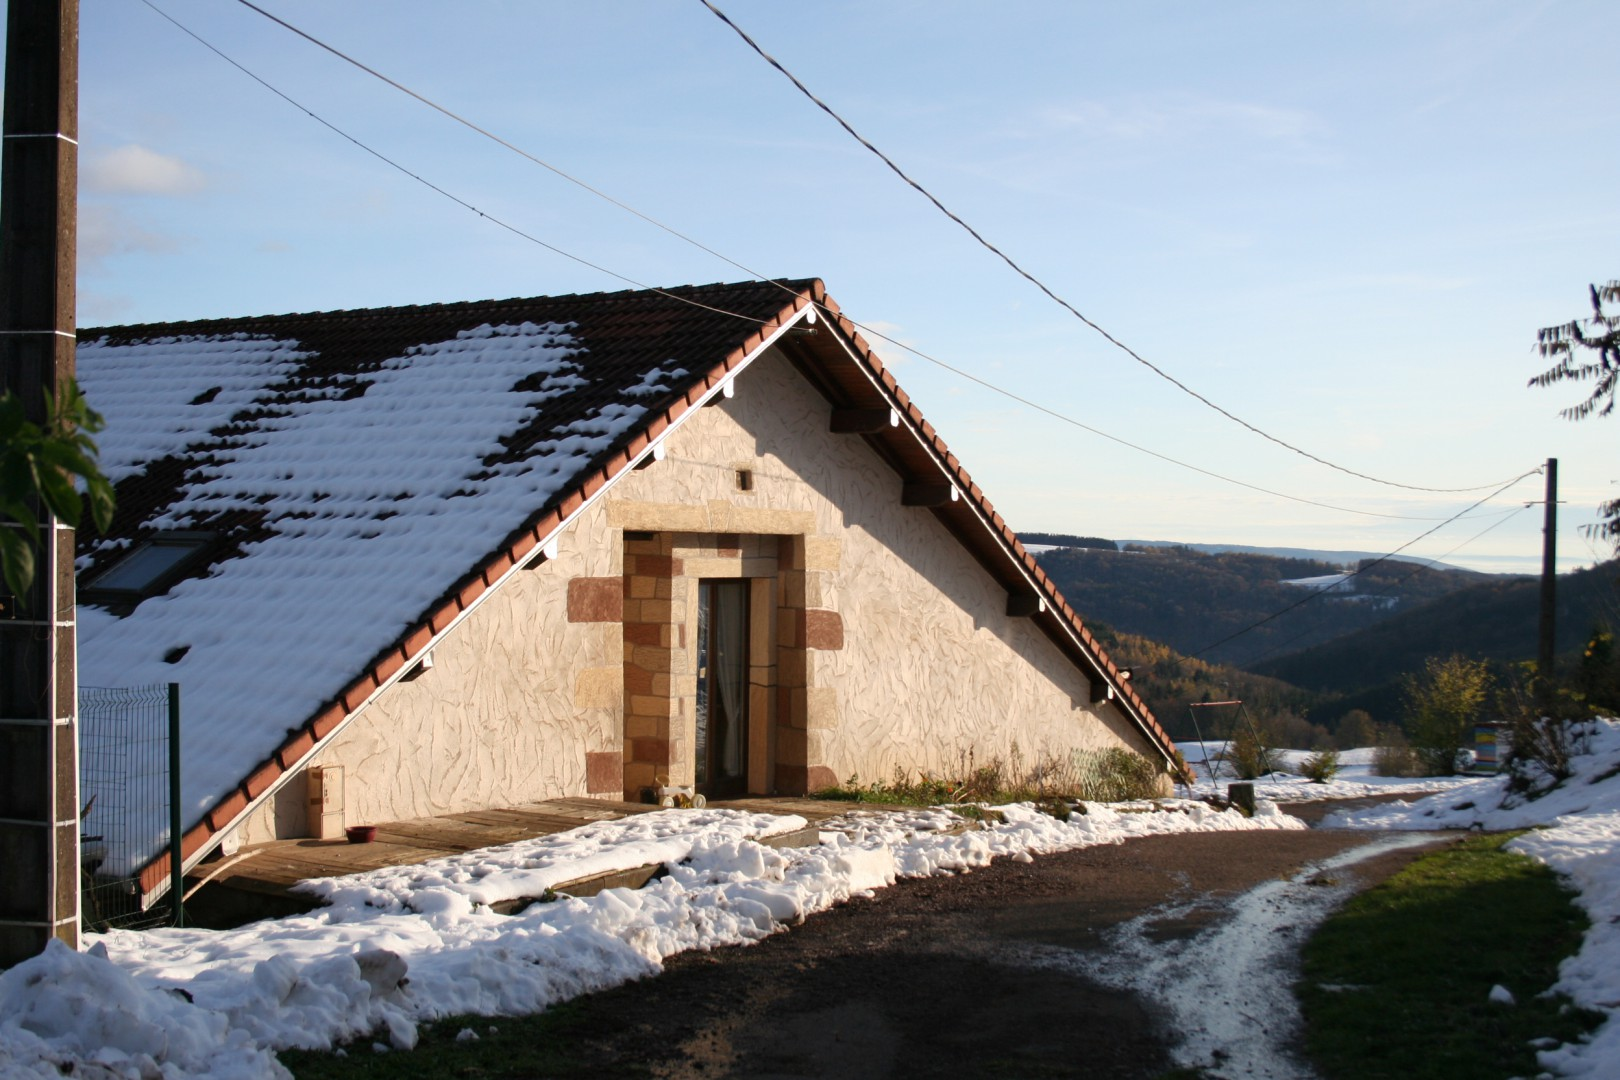 Woning met schitterend uitzicht over vallei